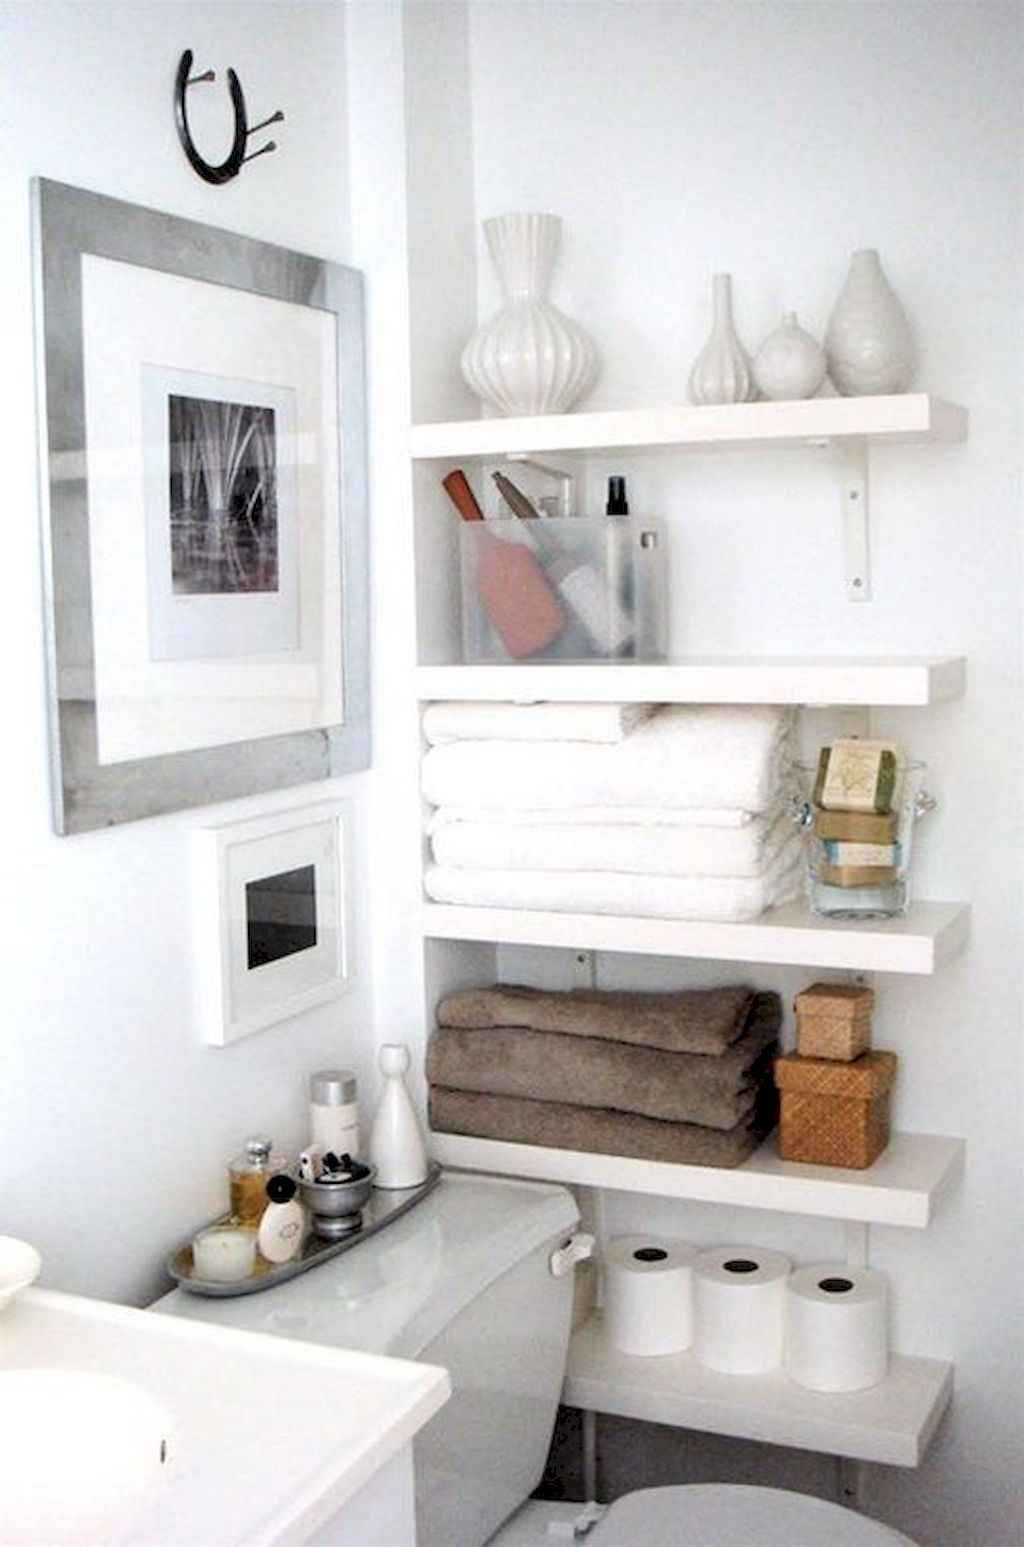 111 Brilliant Small Bathroom Remodel Ideas On A Budget (35)